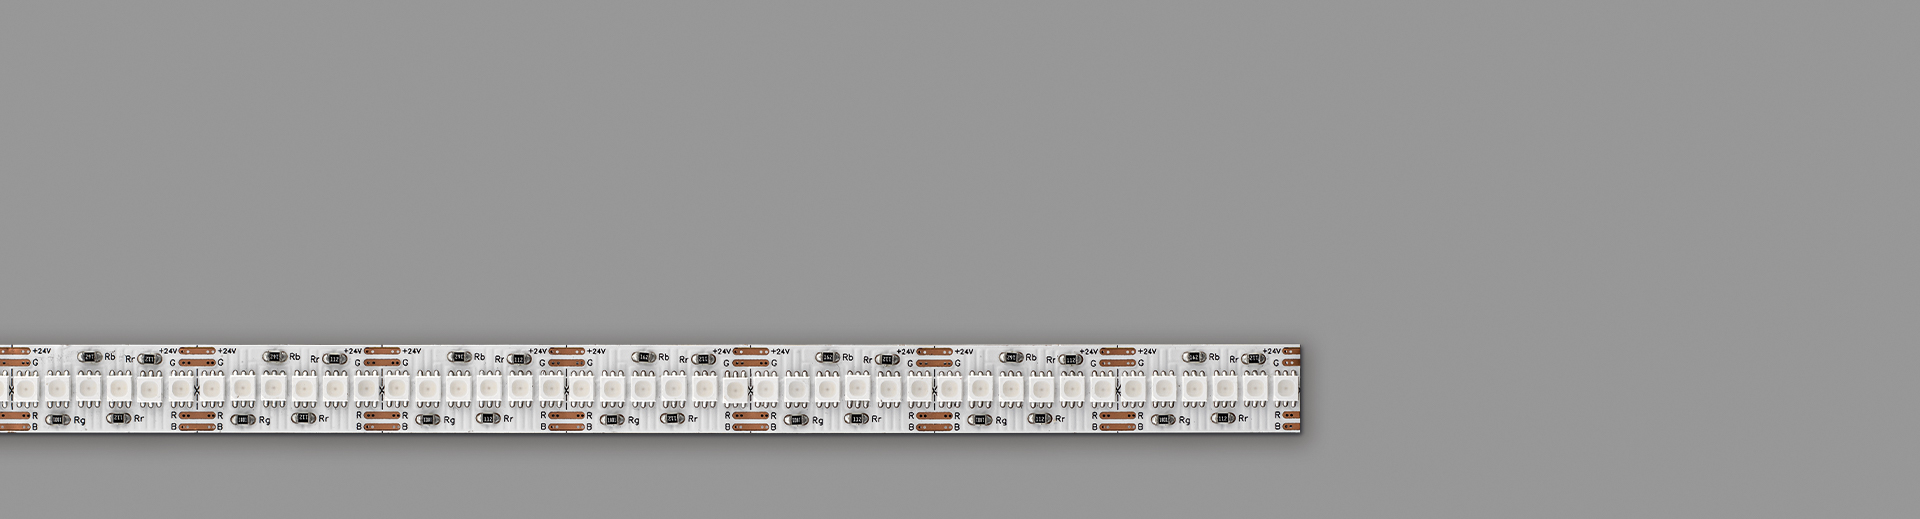 DuraLamp_DT Ultra HD RGB_Banner (1)